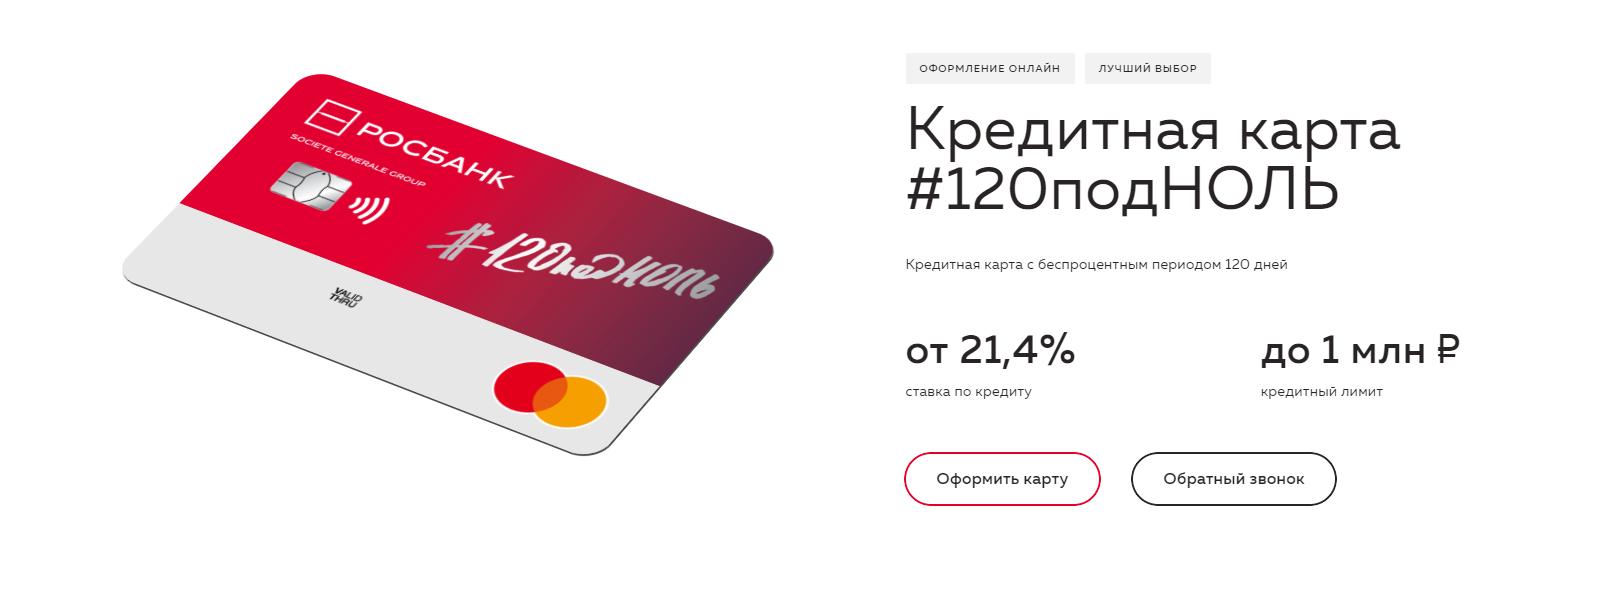 kreditnaya-karta-120-dnej-bez-procentov_10